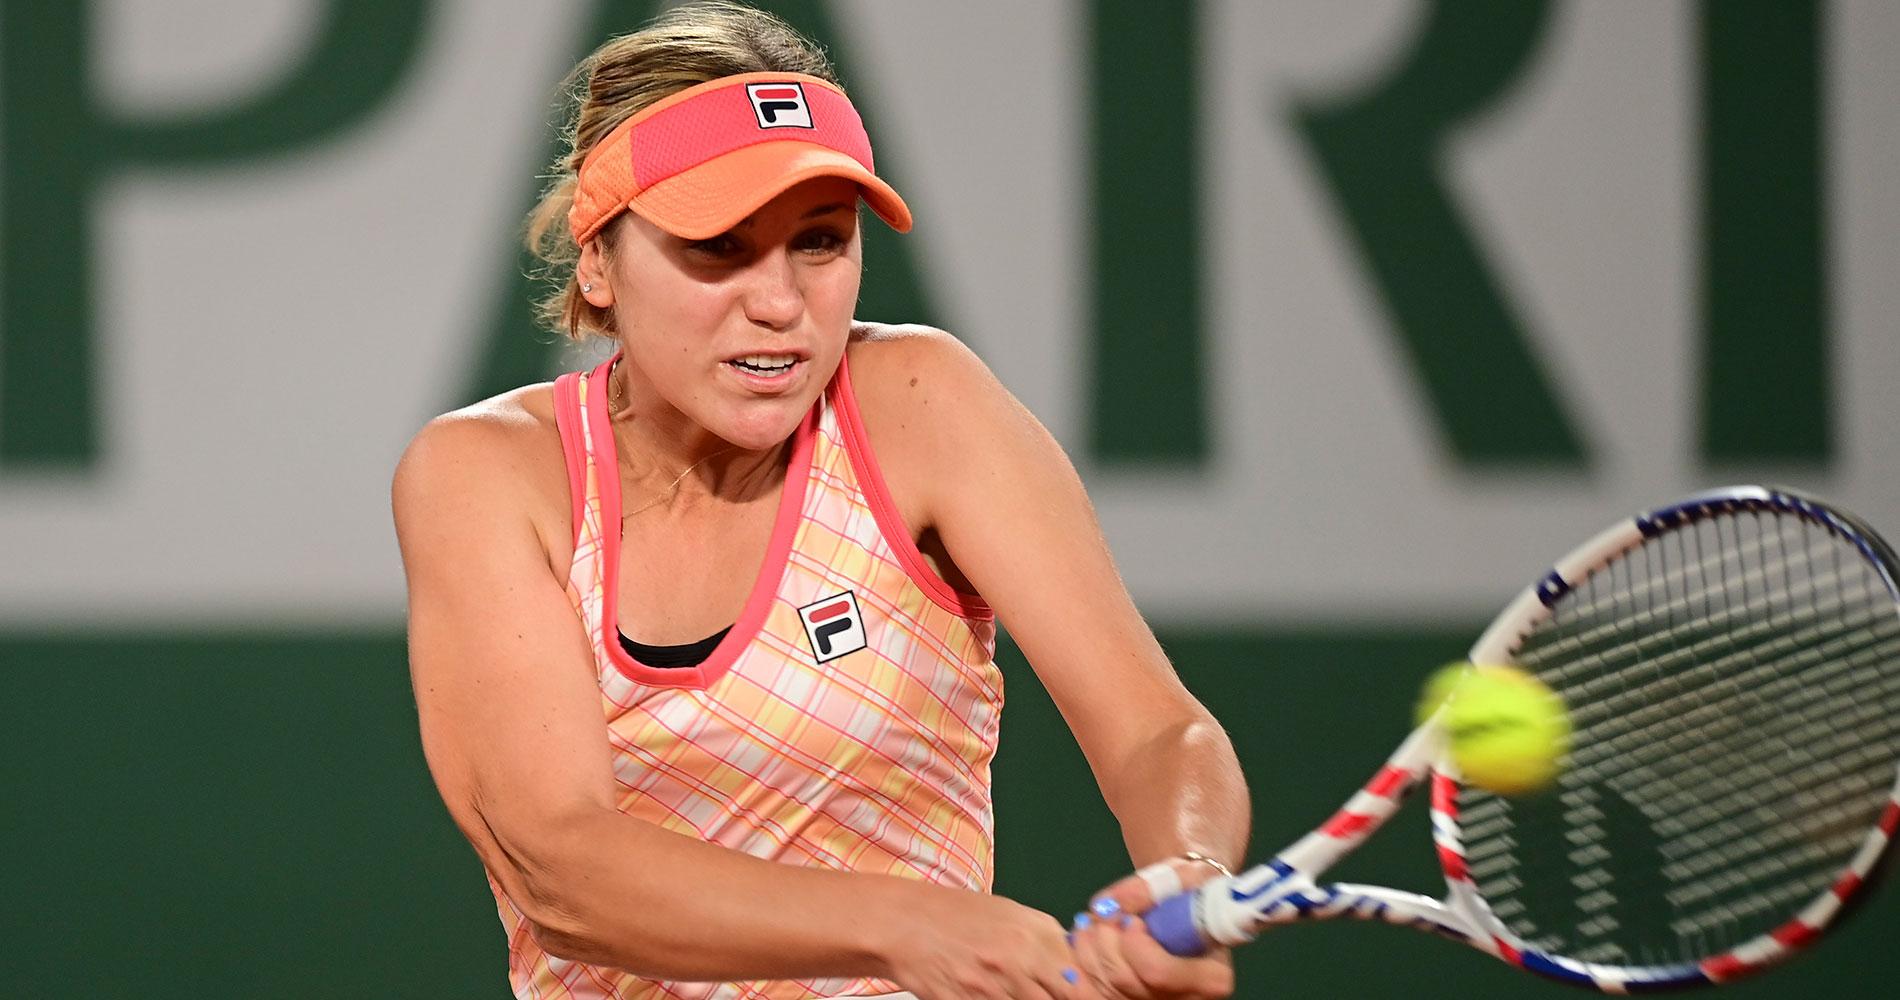 Sofia Kenin Roland-Garros 2020 fourth round